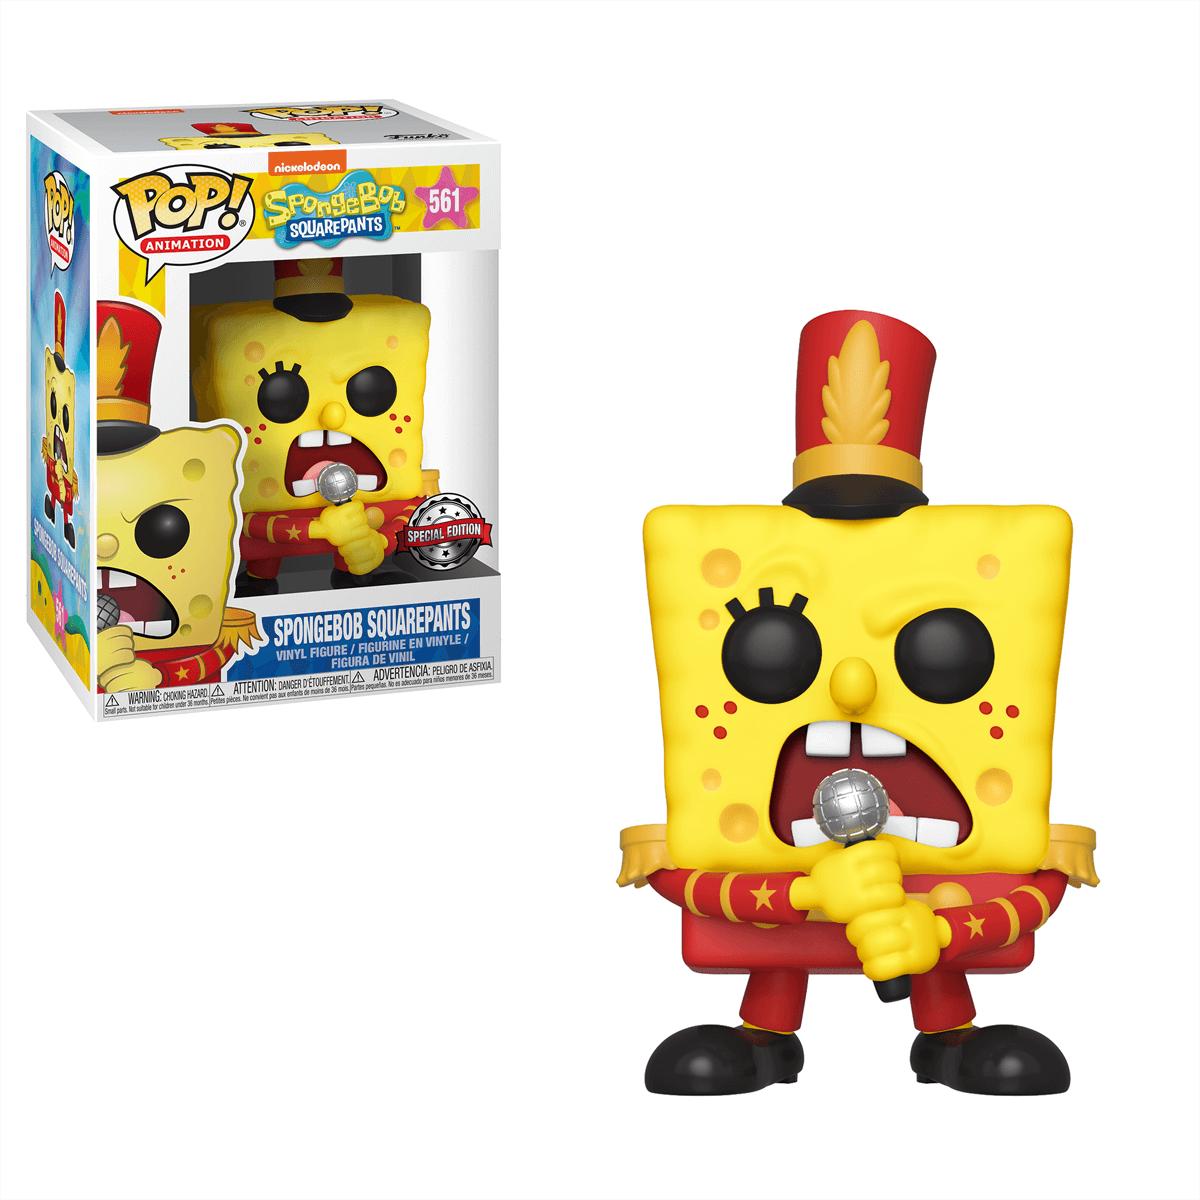 Funko Pop! Animation: SpongeBob Squarepants - SpongeBob